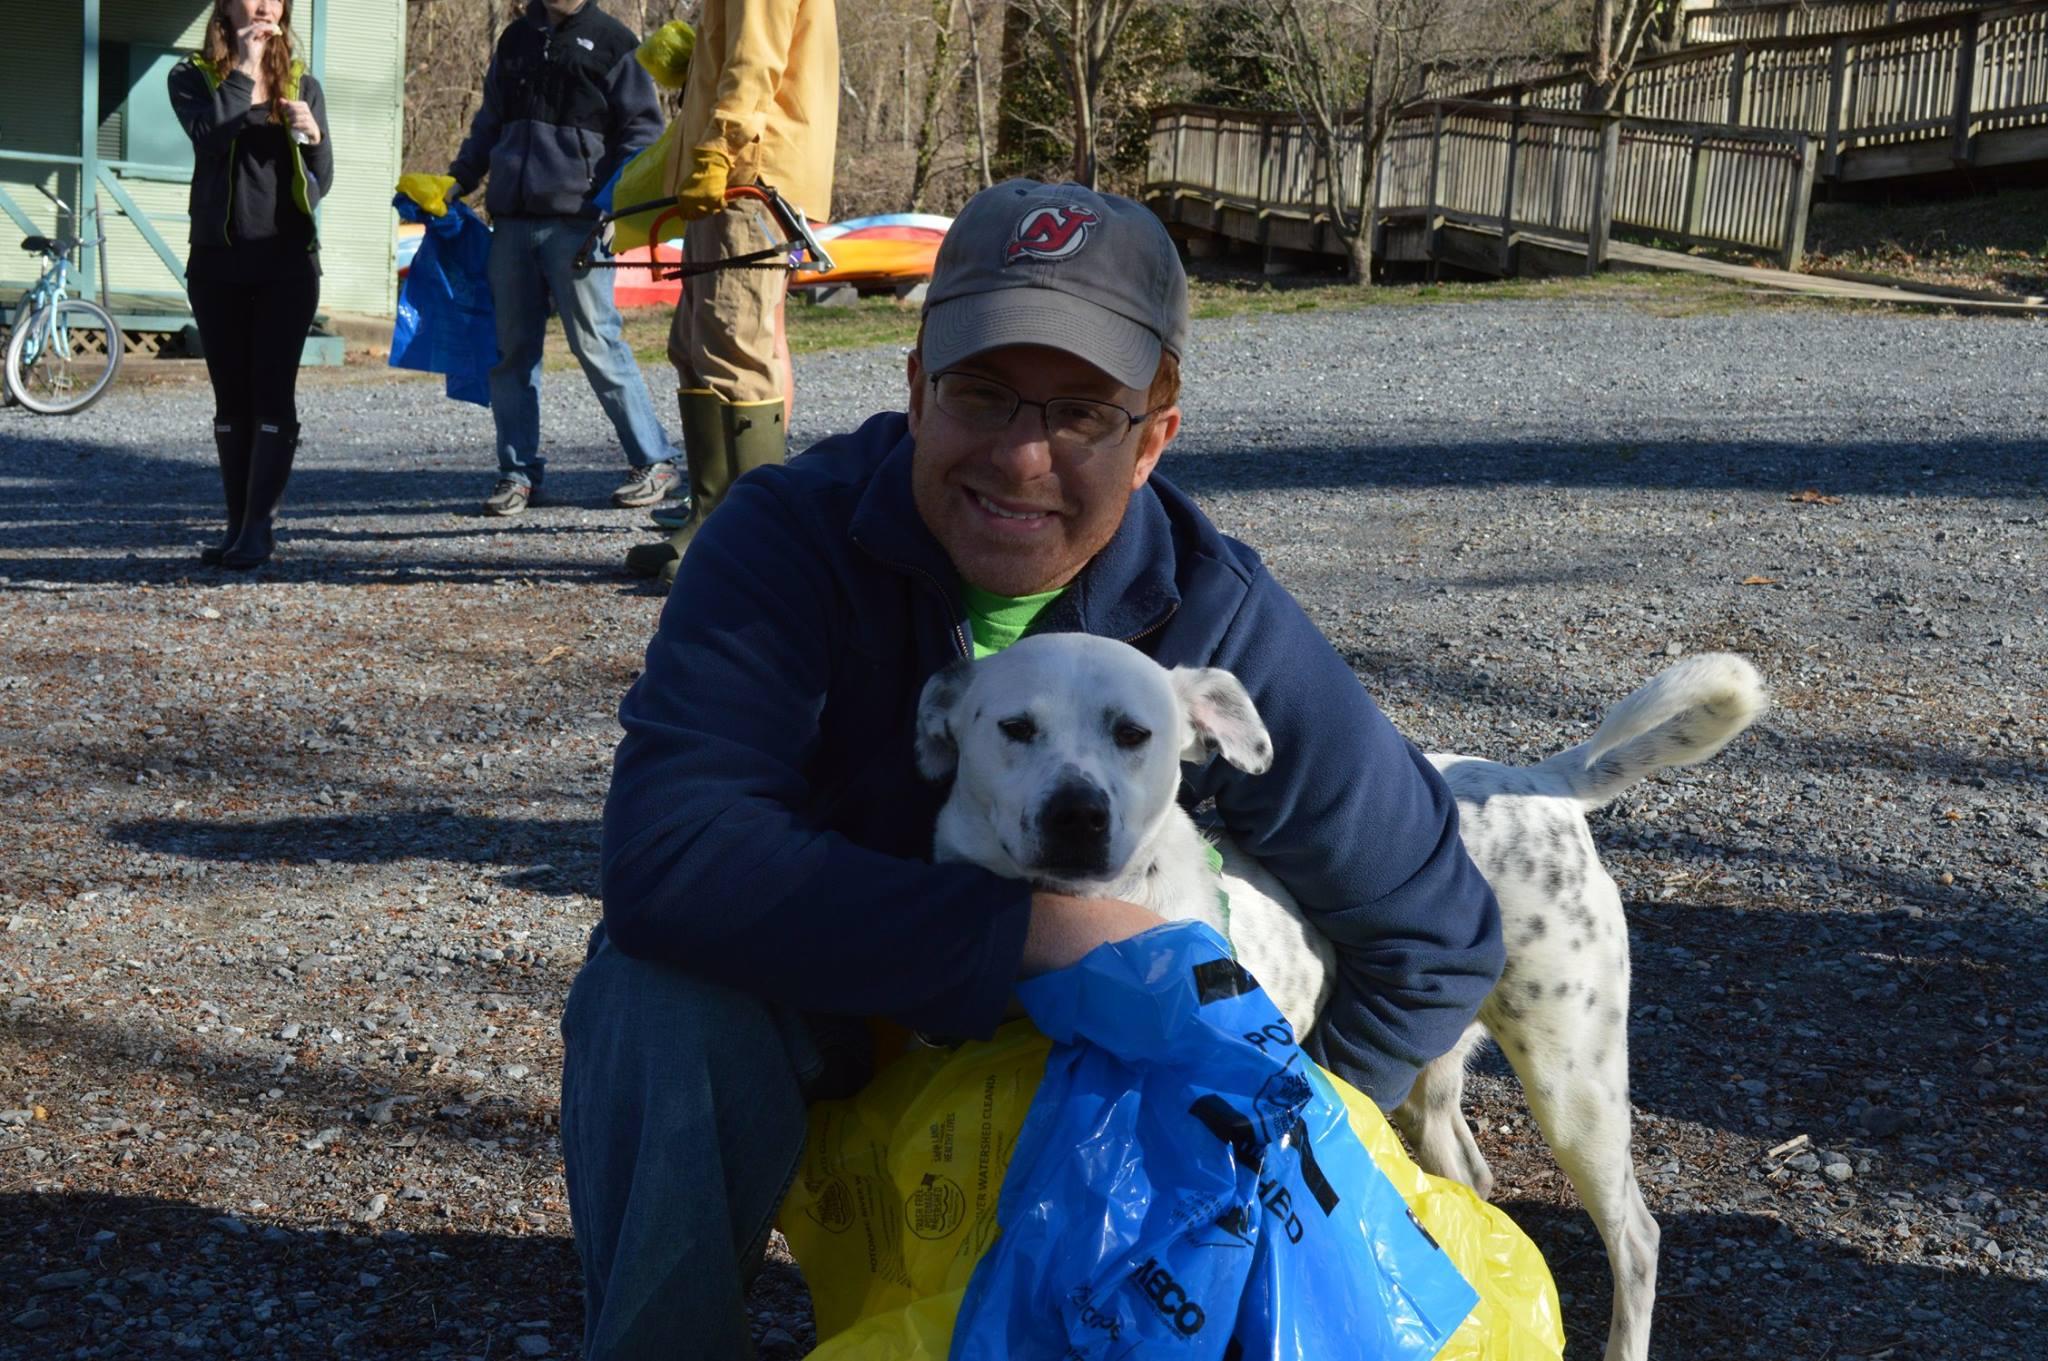 potomac river cleanup volunteer